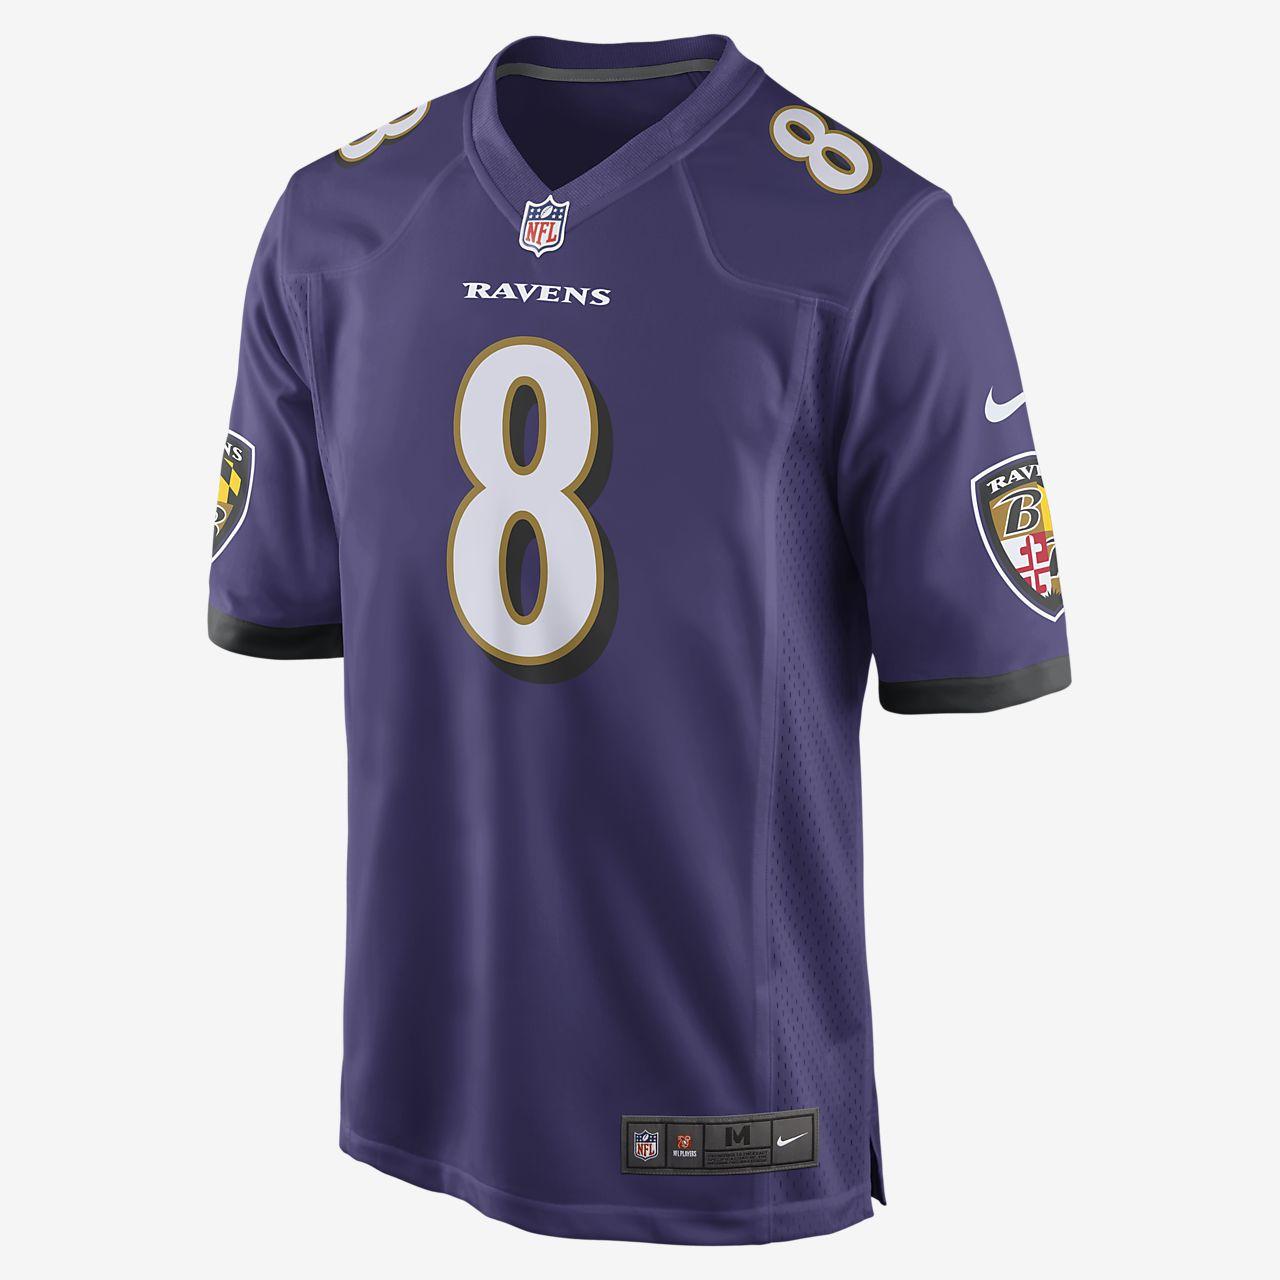 Camiseta de fútbol americano para hombre NFL Baltimore Ravens Game (Lamar Jackson)